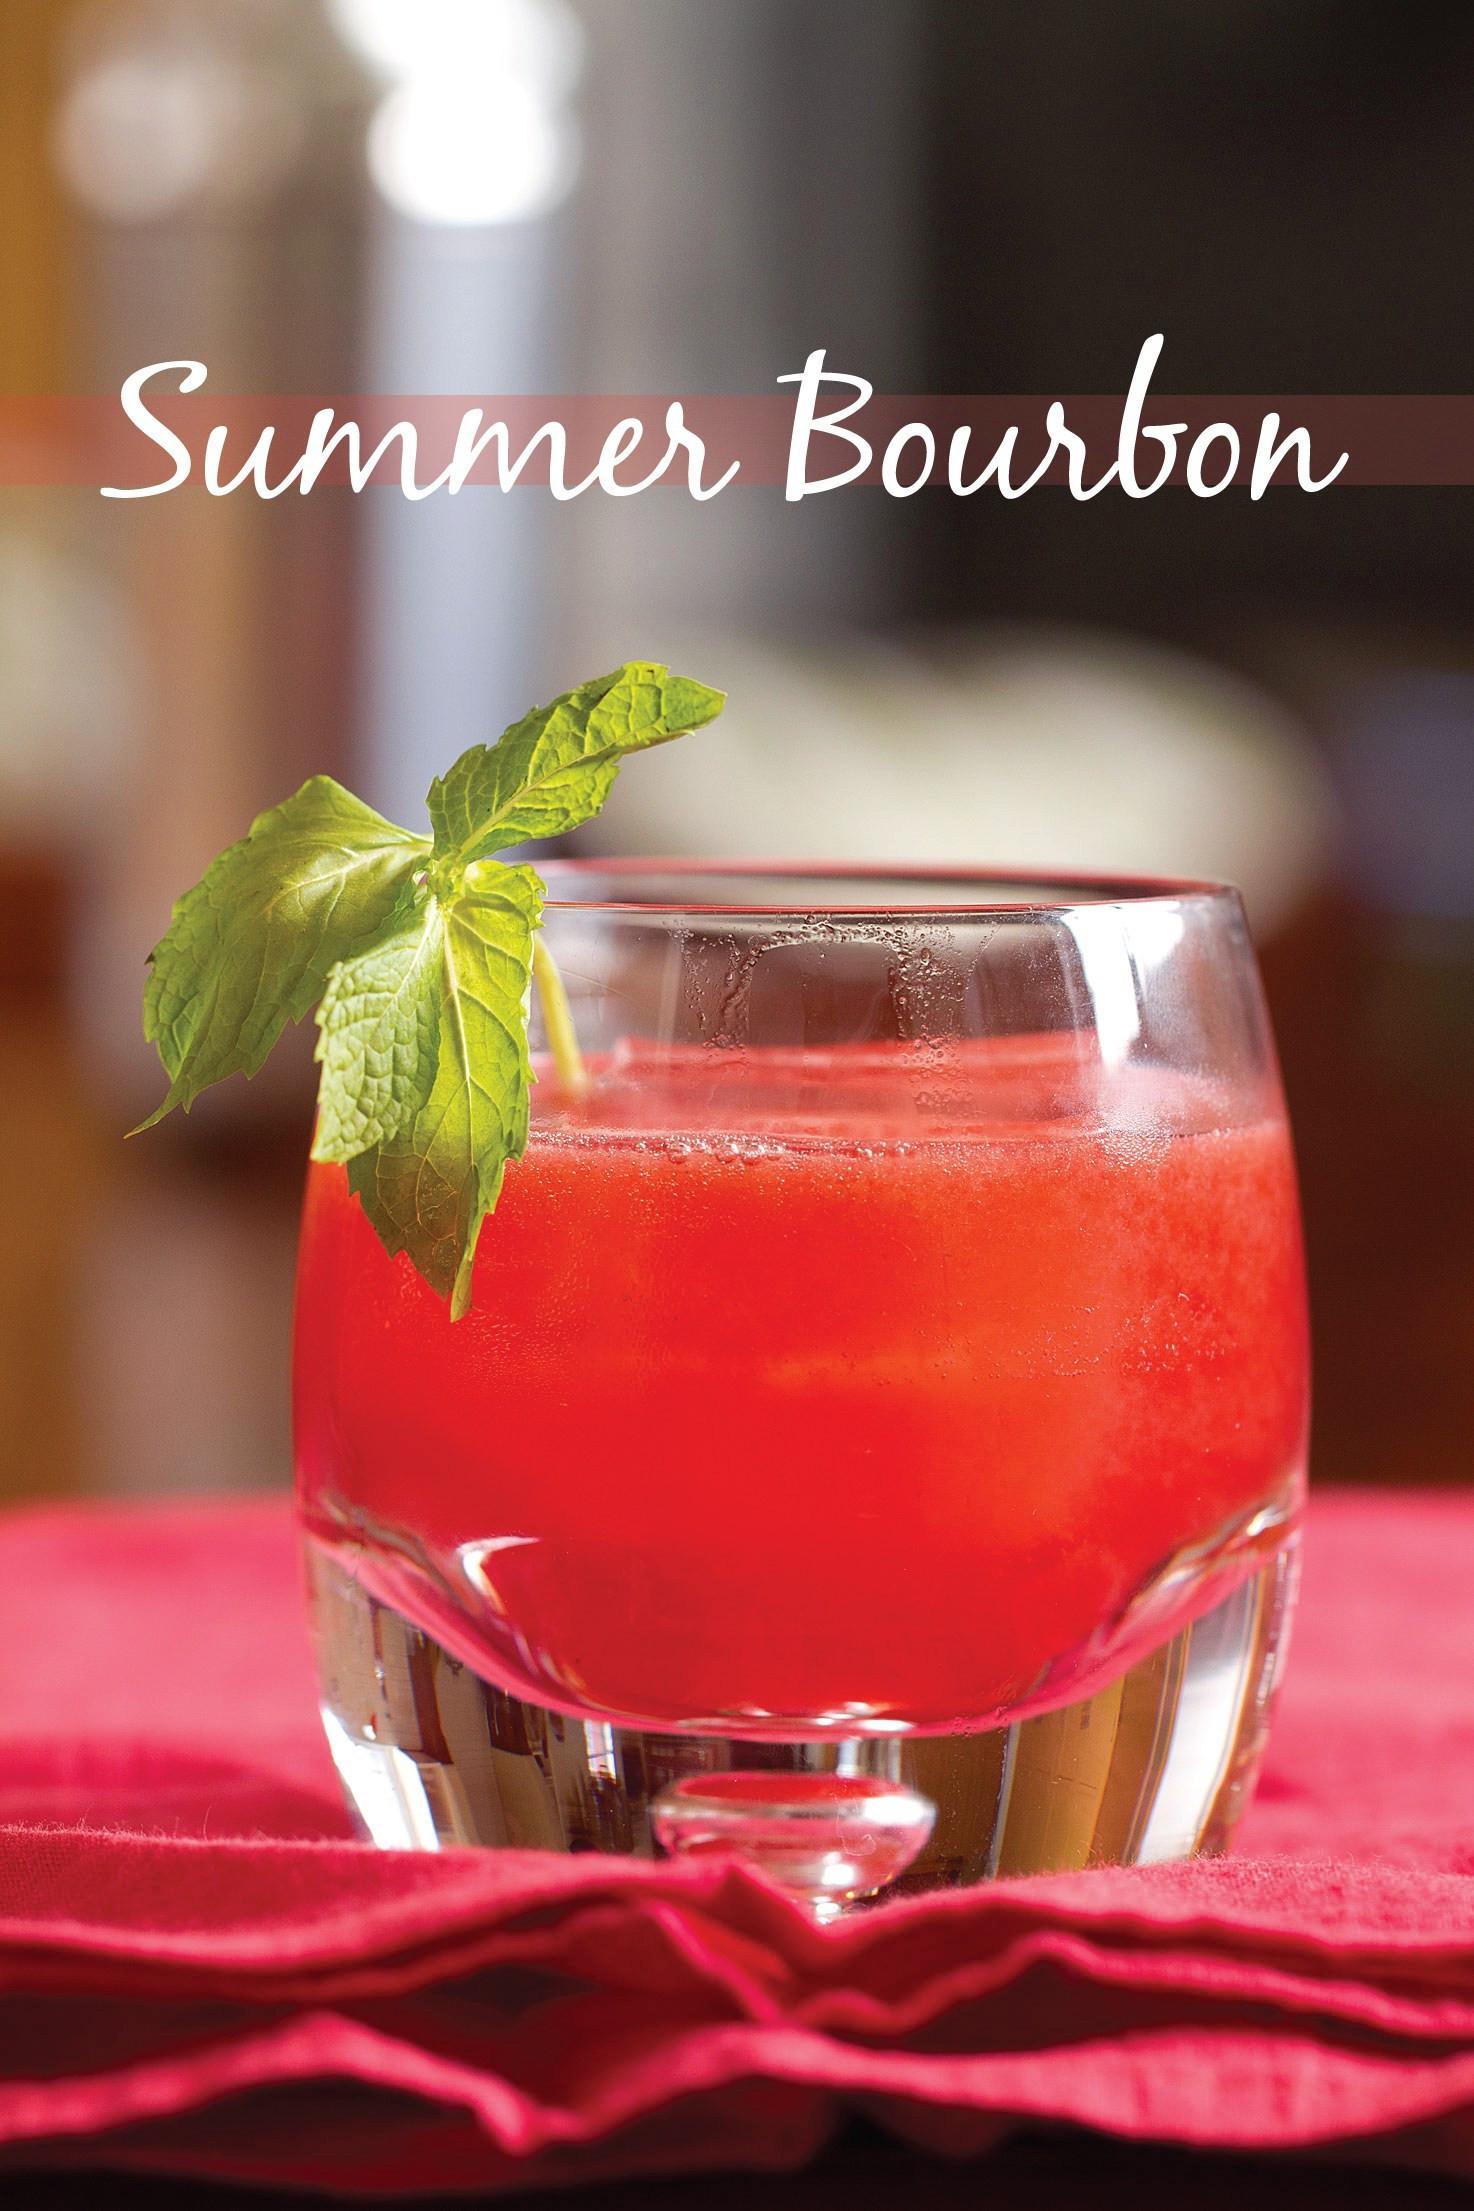 Summer Bourbon Drinks  Summer Bourbon is that an Oxymoron SippitySup